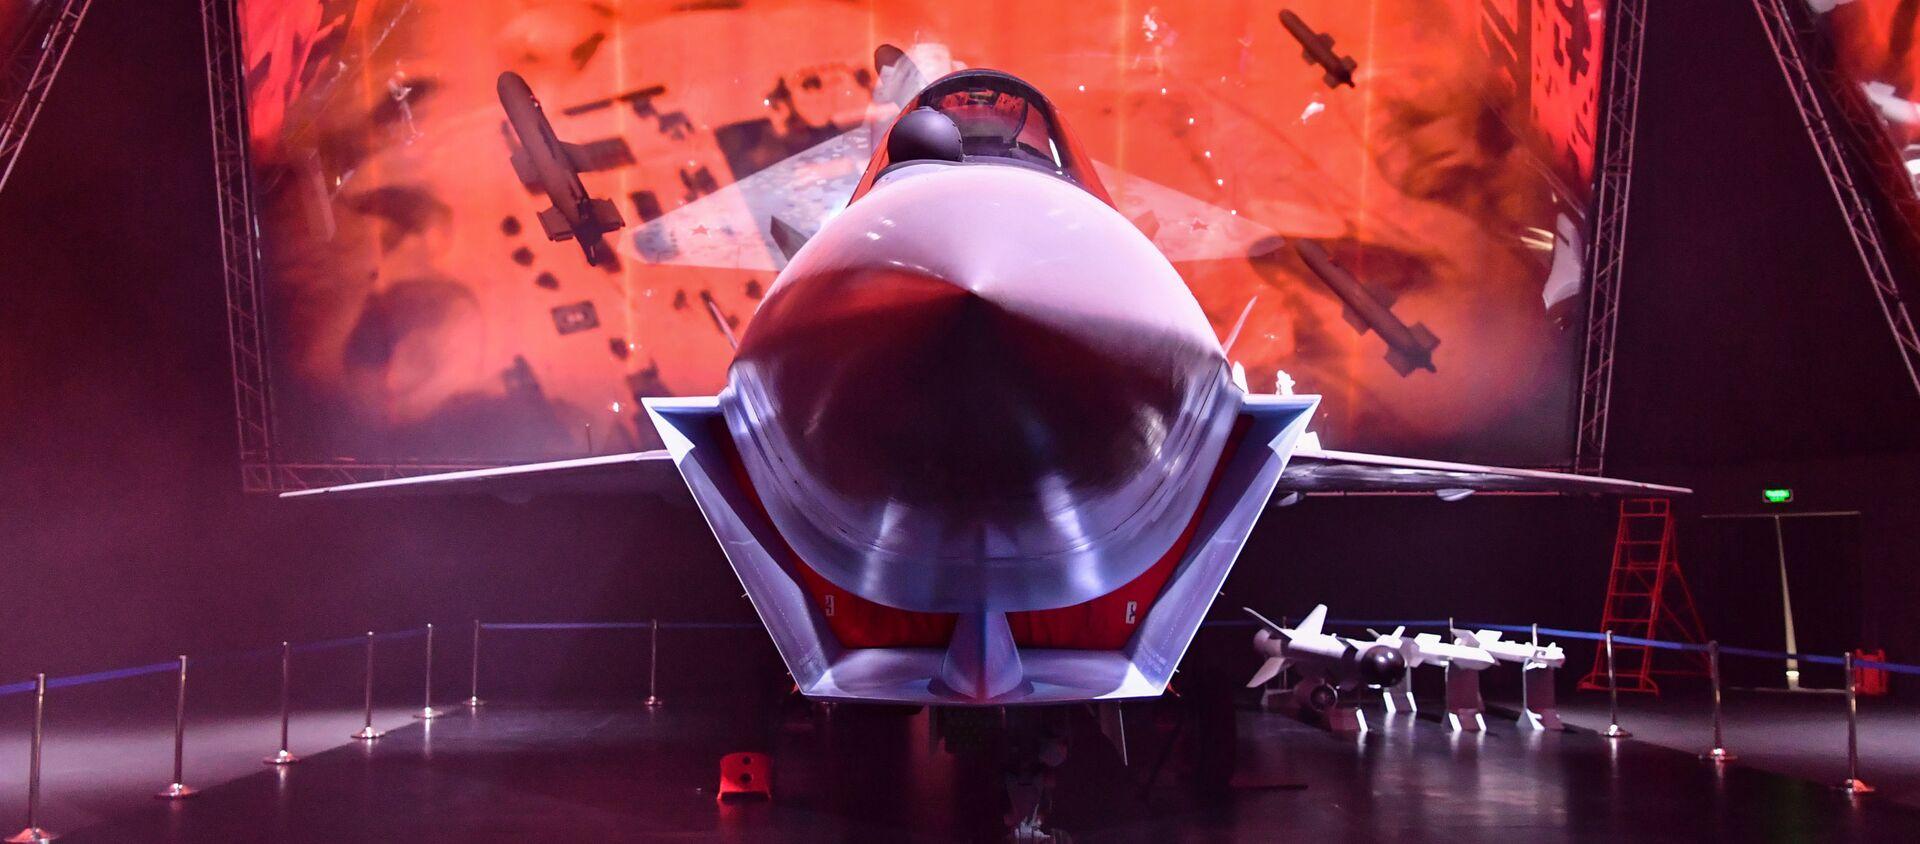 Checkmate fighter jet at Russia's MAKS air show. - Sputnik International, 1920, 21.07.2021